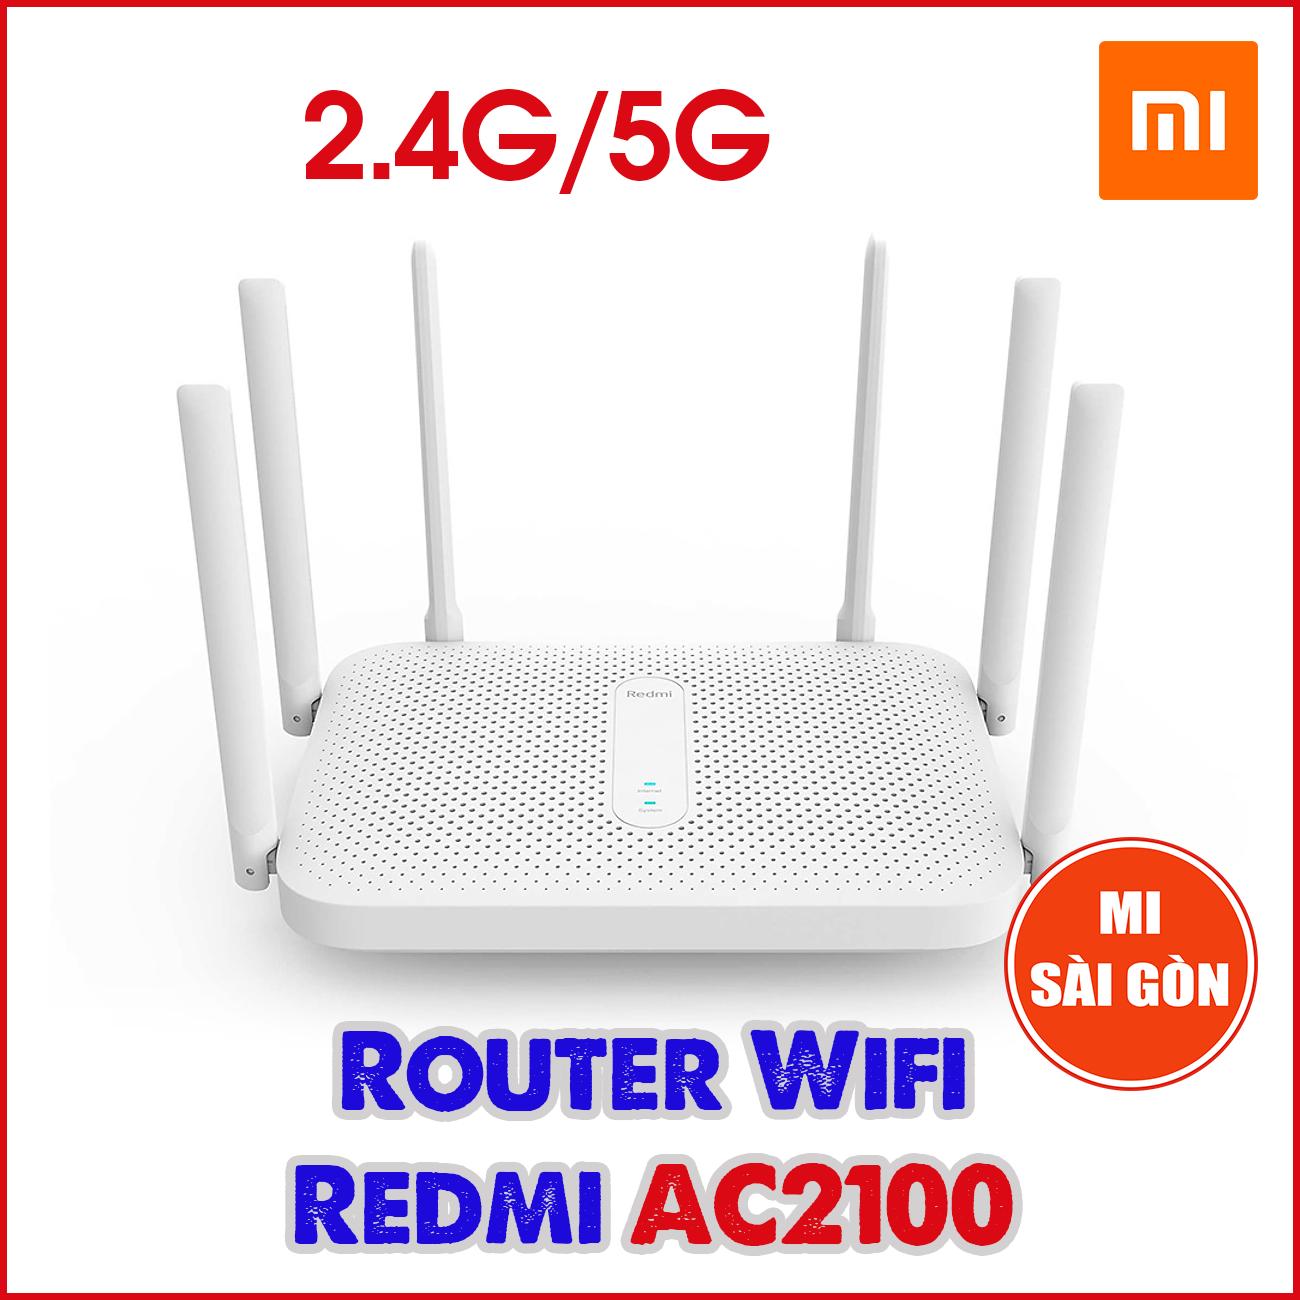 Bộ phát Wifi Router Wifi Redmi AC2100 ( 6 anten ) (TRẮNG)